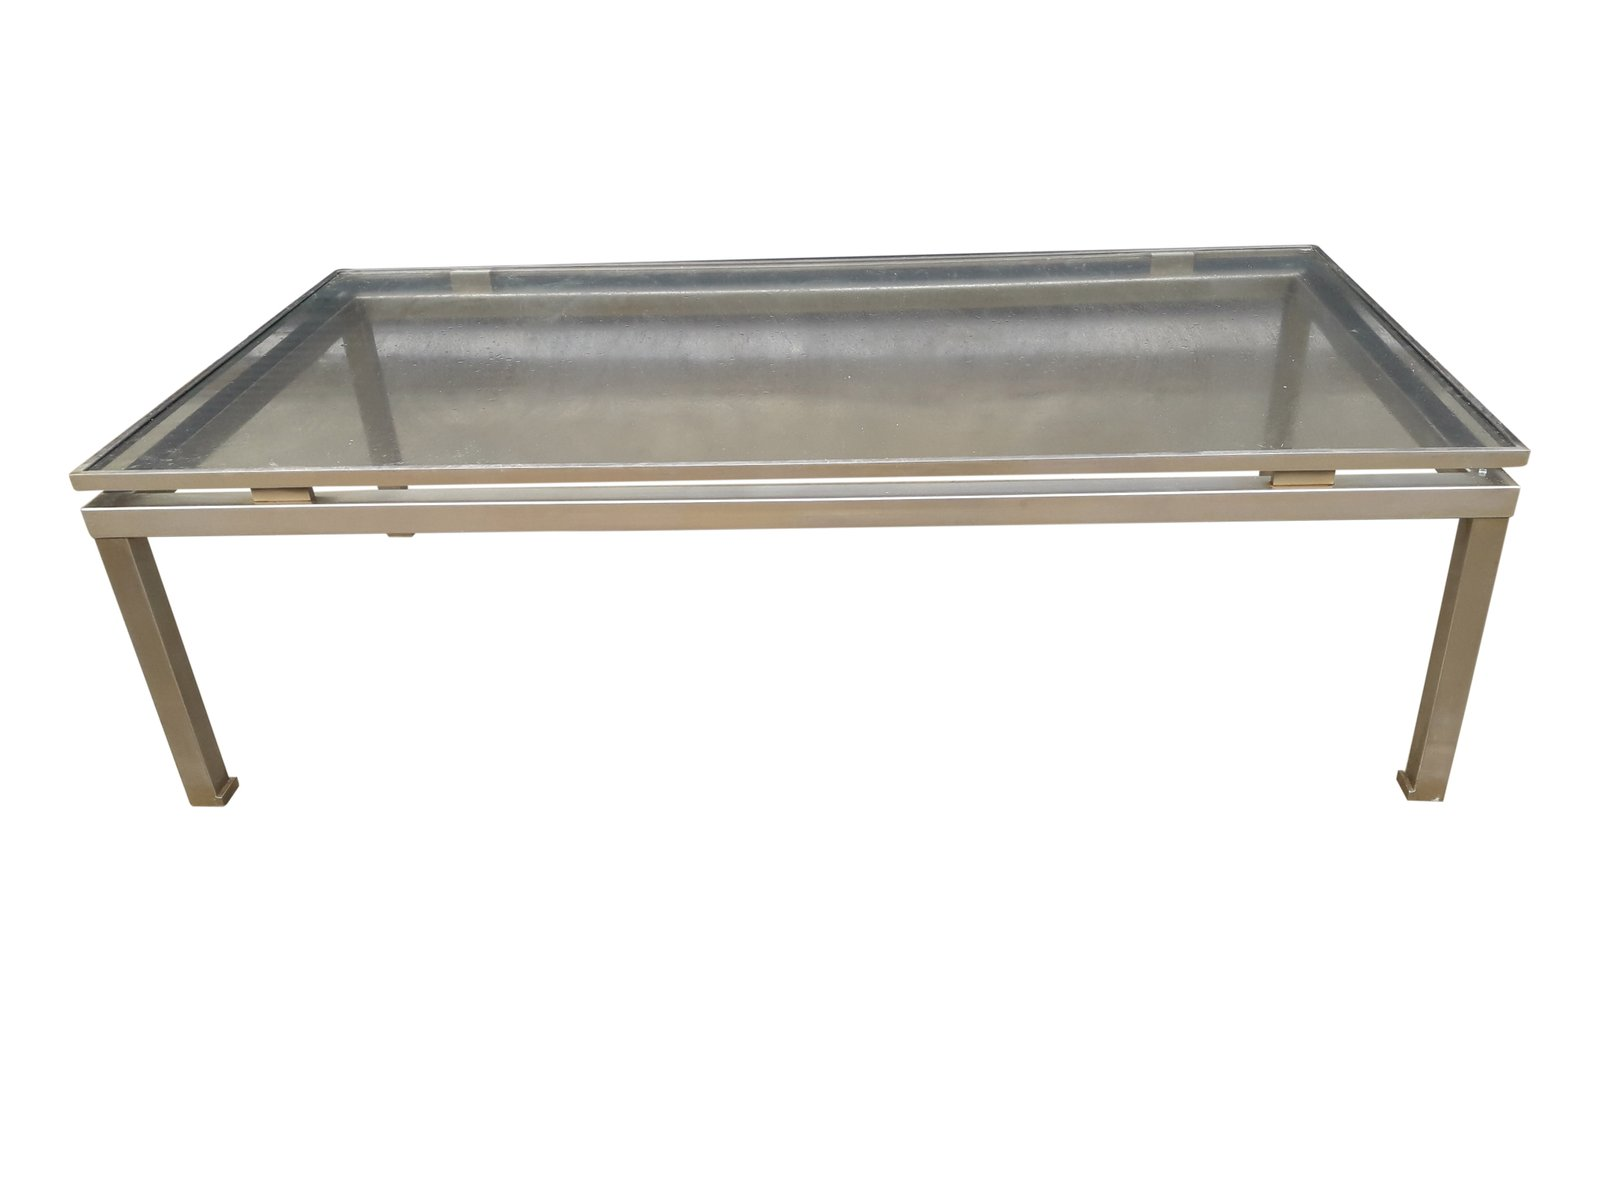 table basse moderniste en acier bross par guy lefevre pour maison jansen en vente sur pamono. Black Bedroom Furniture Sets. Home Design Ideas